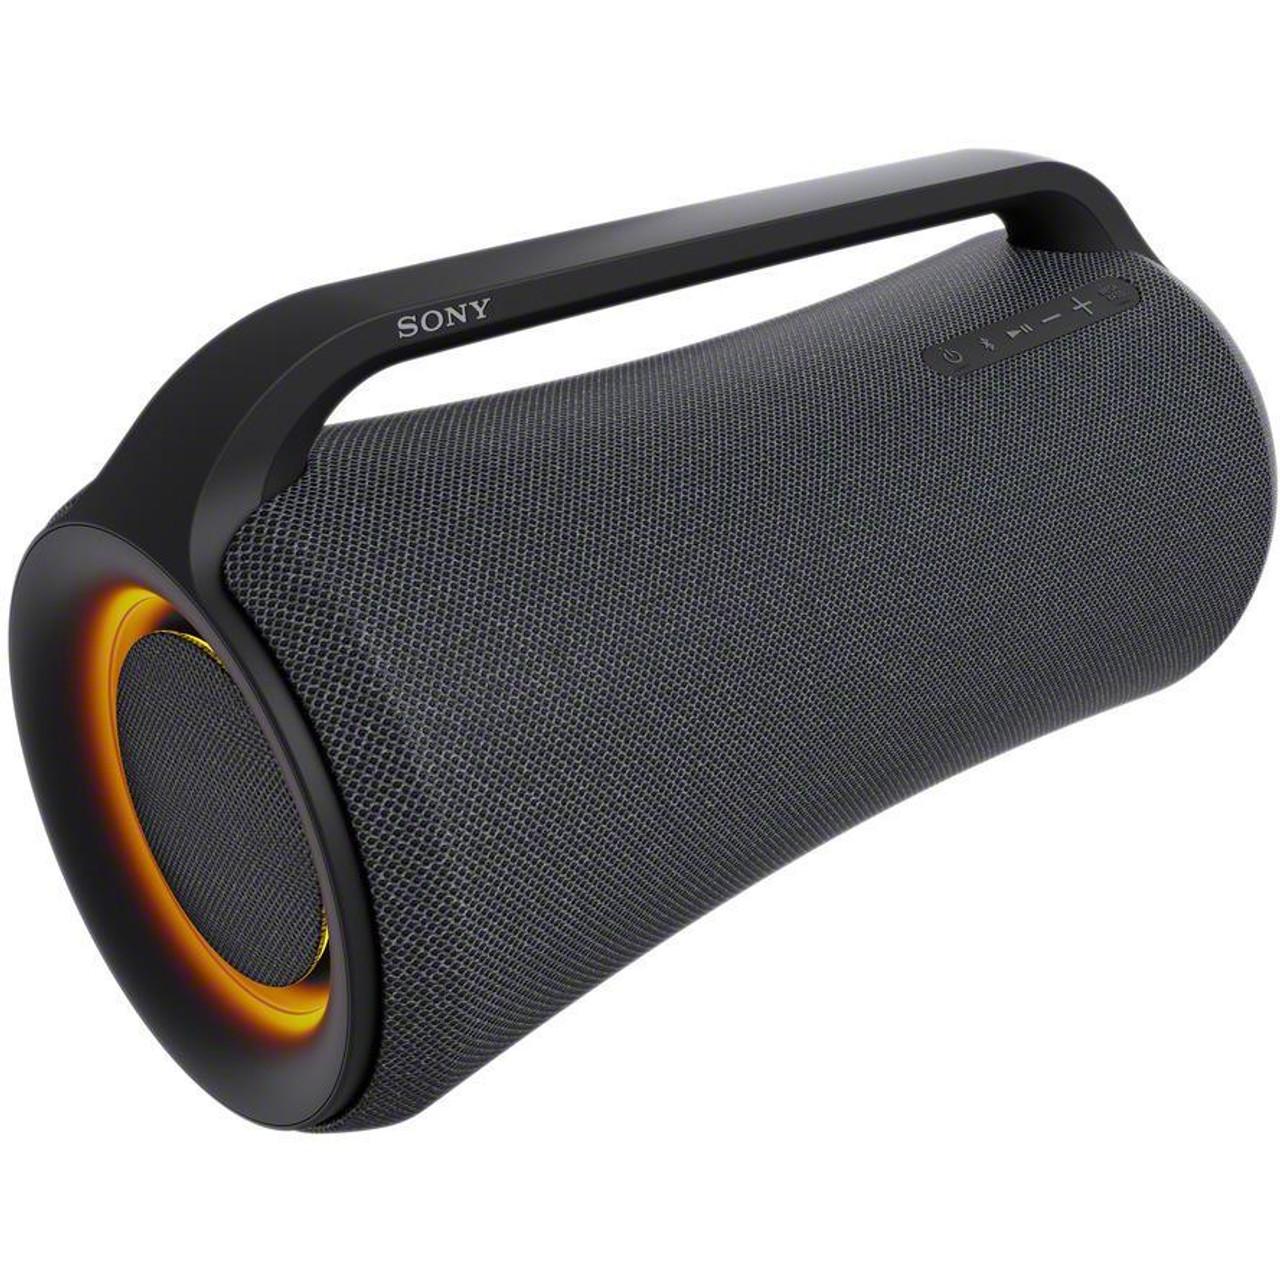 Sony SRS-XG500 X Series Bluetooth Portable Wireless Party Speaker - Black